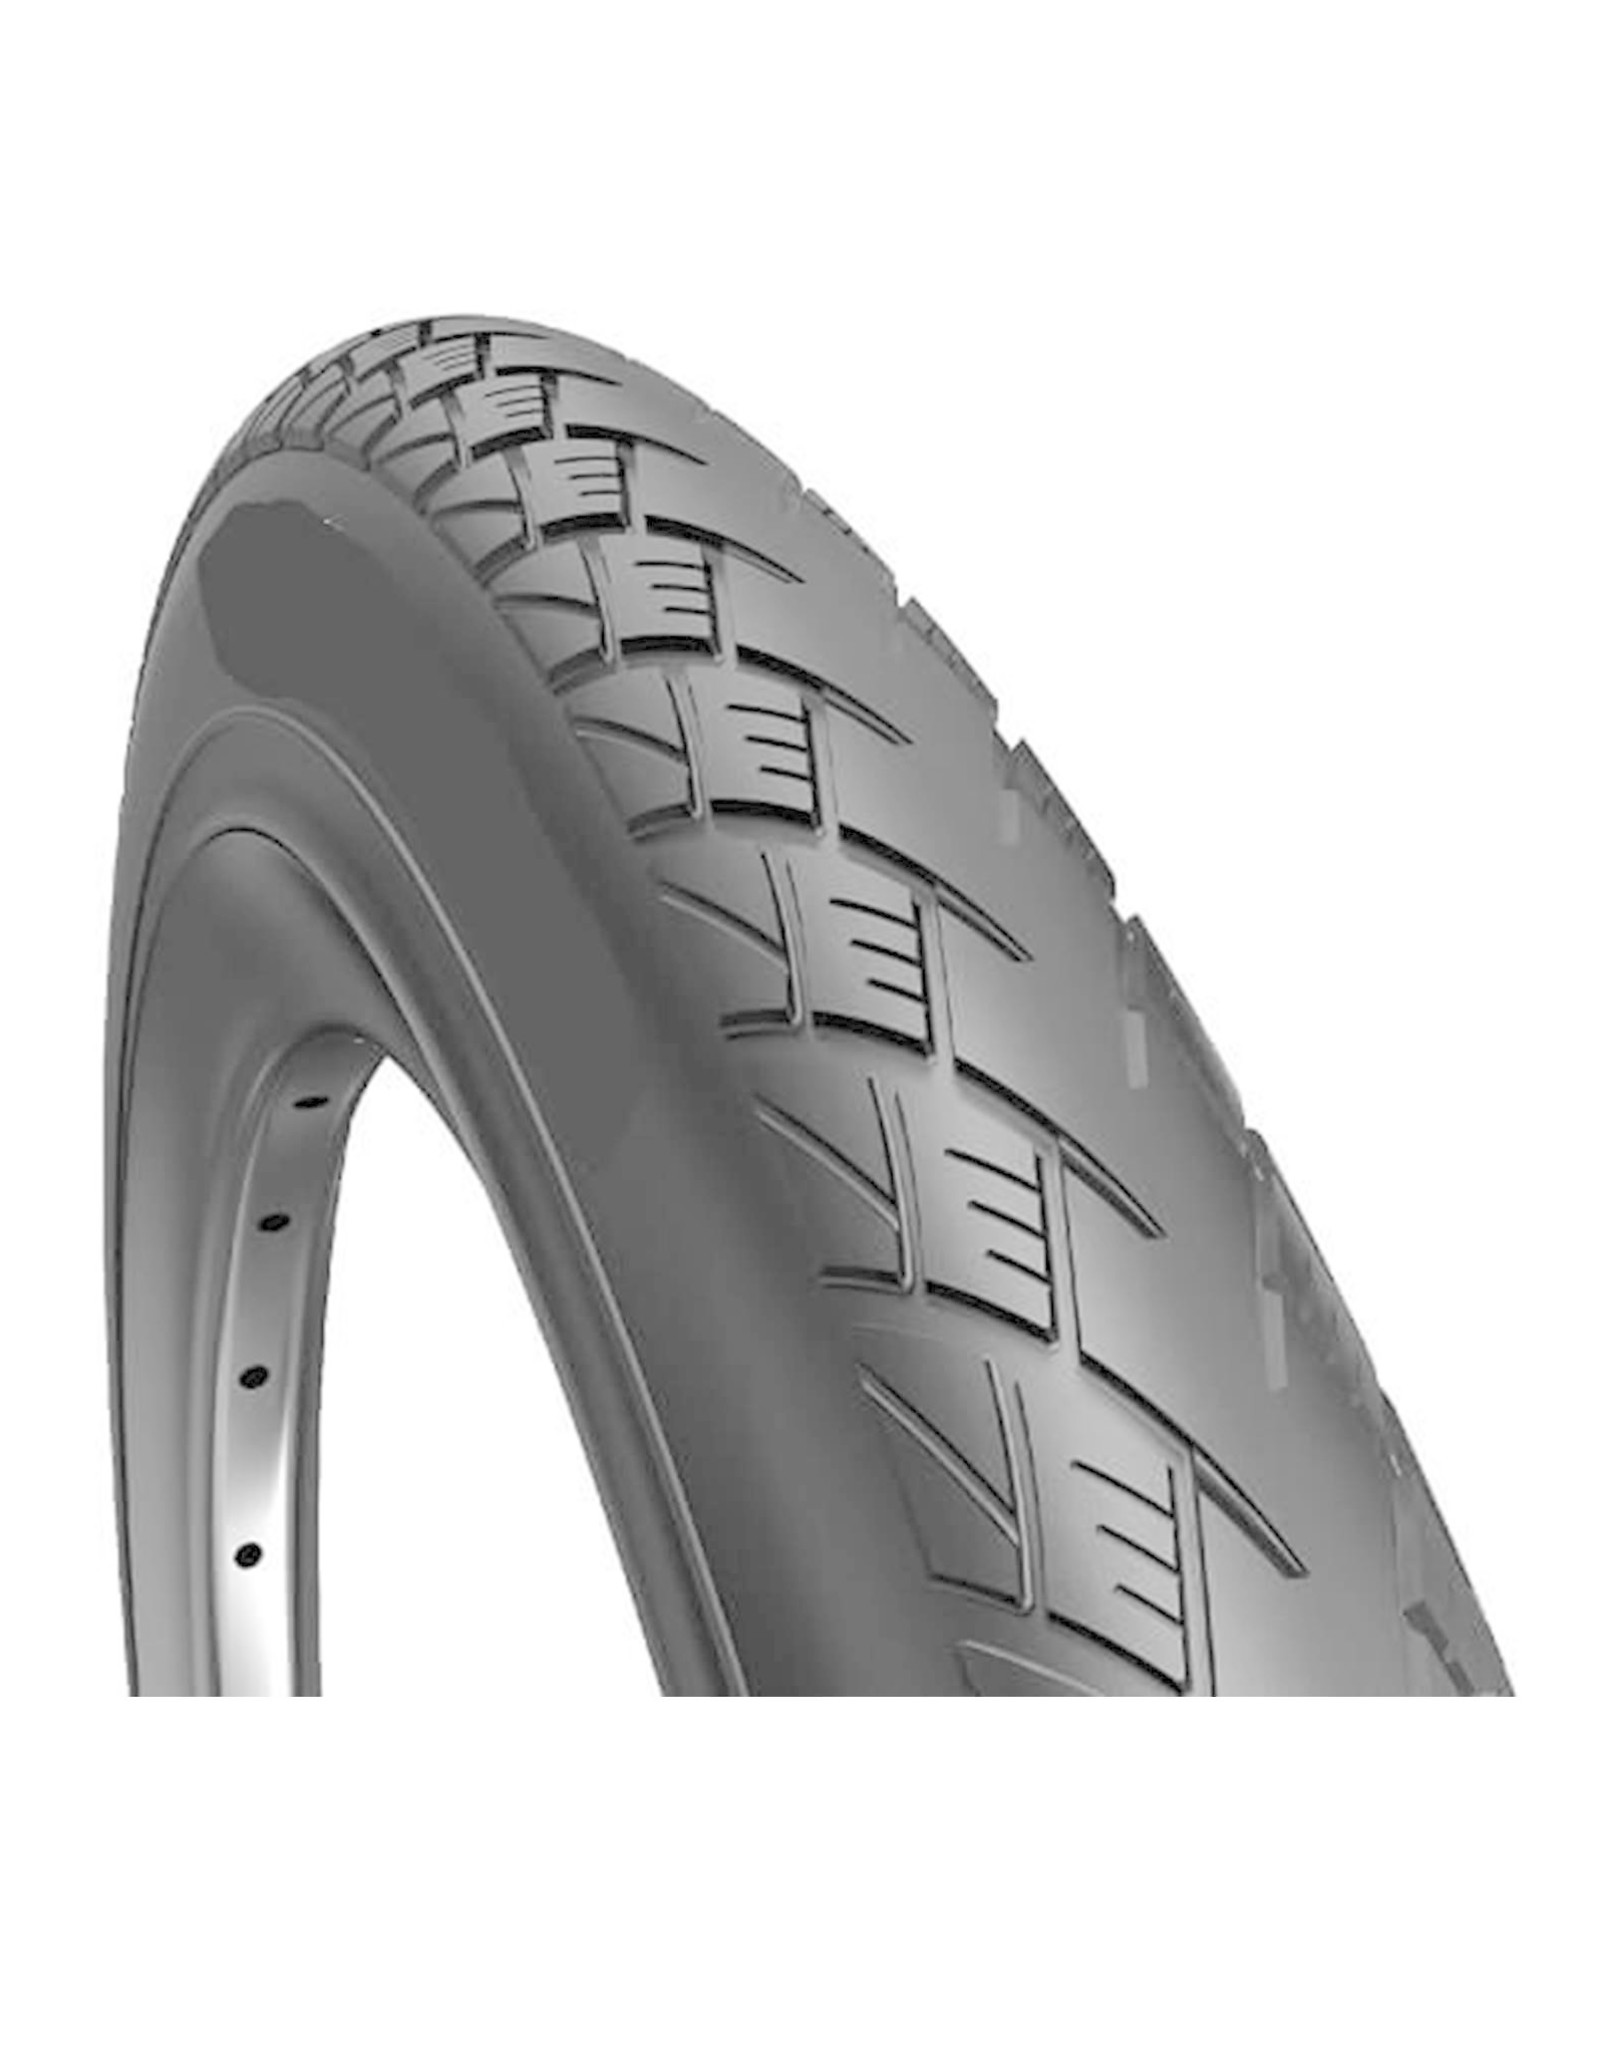 Rocket City Runner 700 X 45 PG Tyre